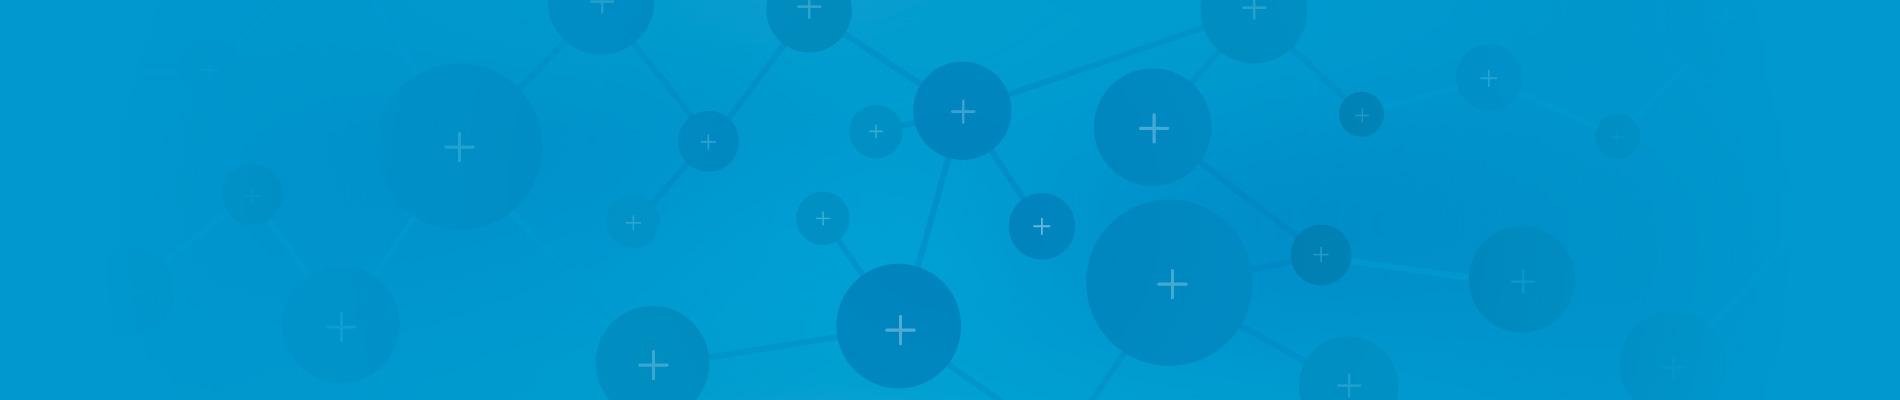 Nureva visual collaboration ecosystem - Integrations